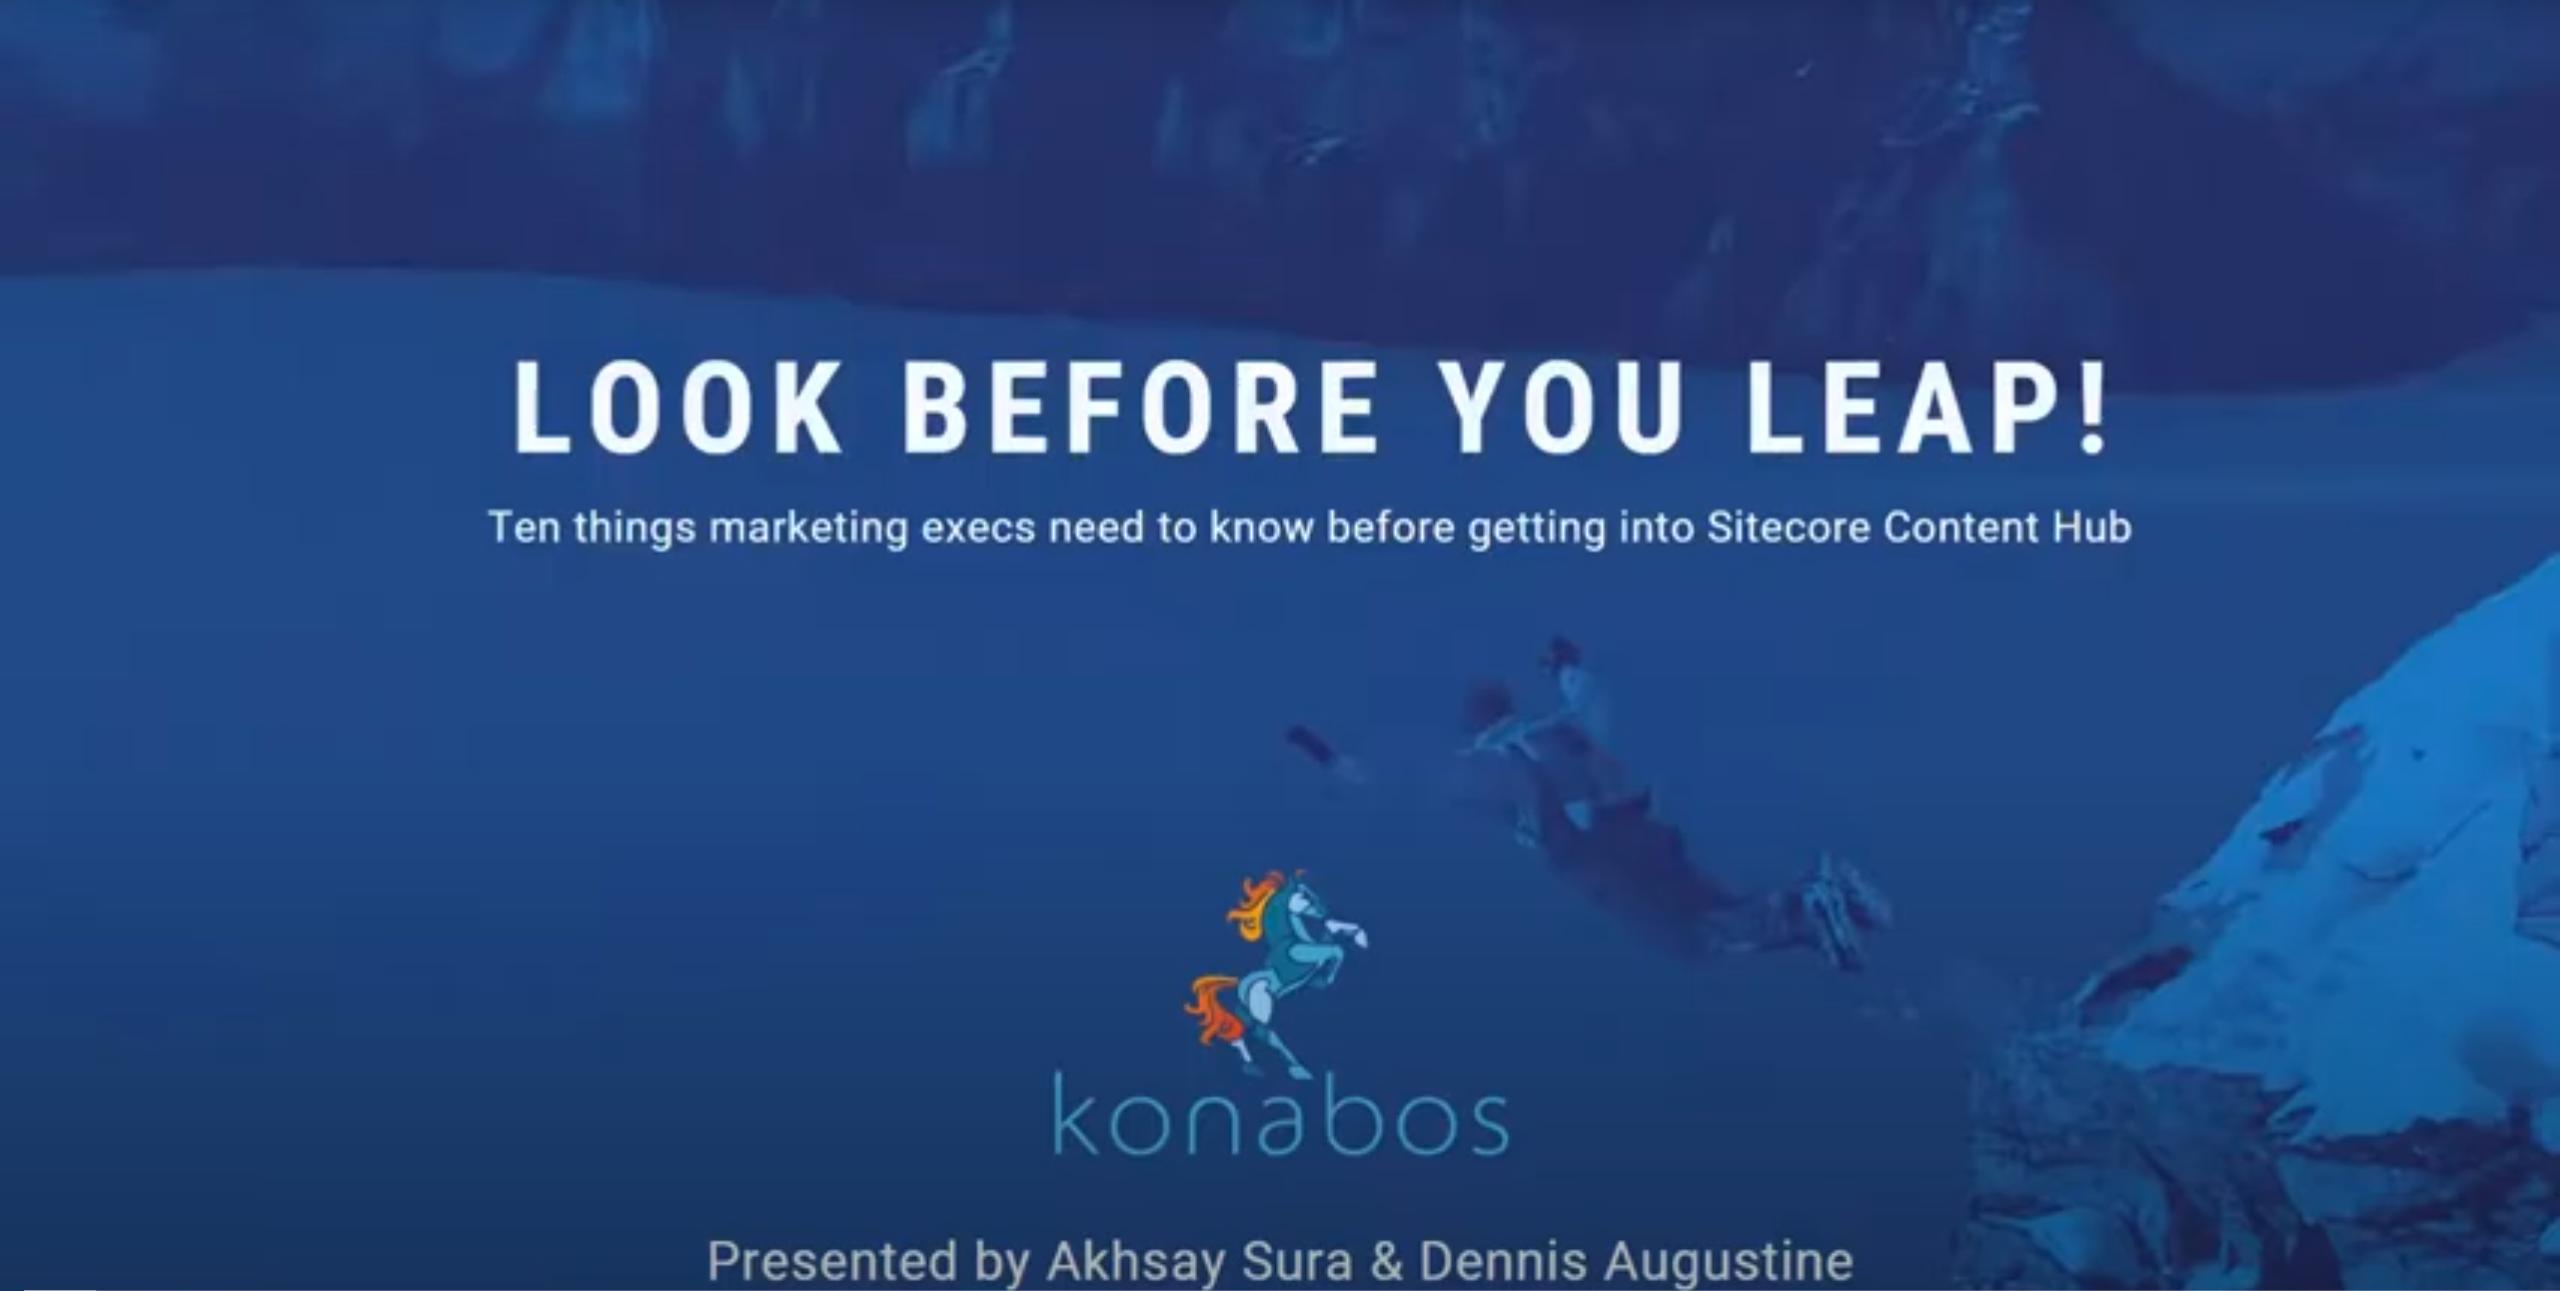 Look Before You Leap Webinar